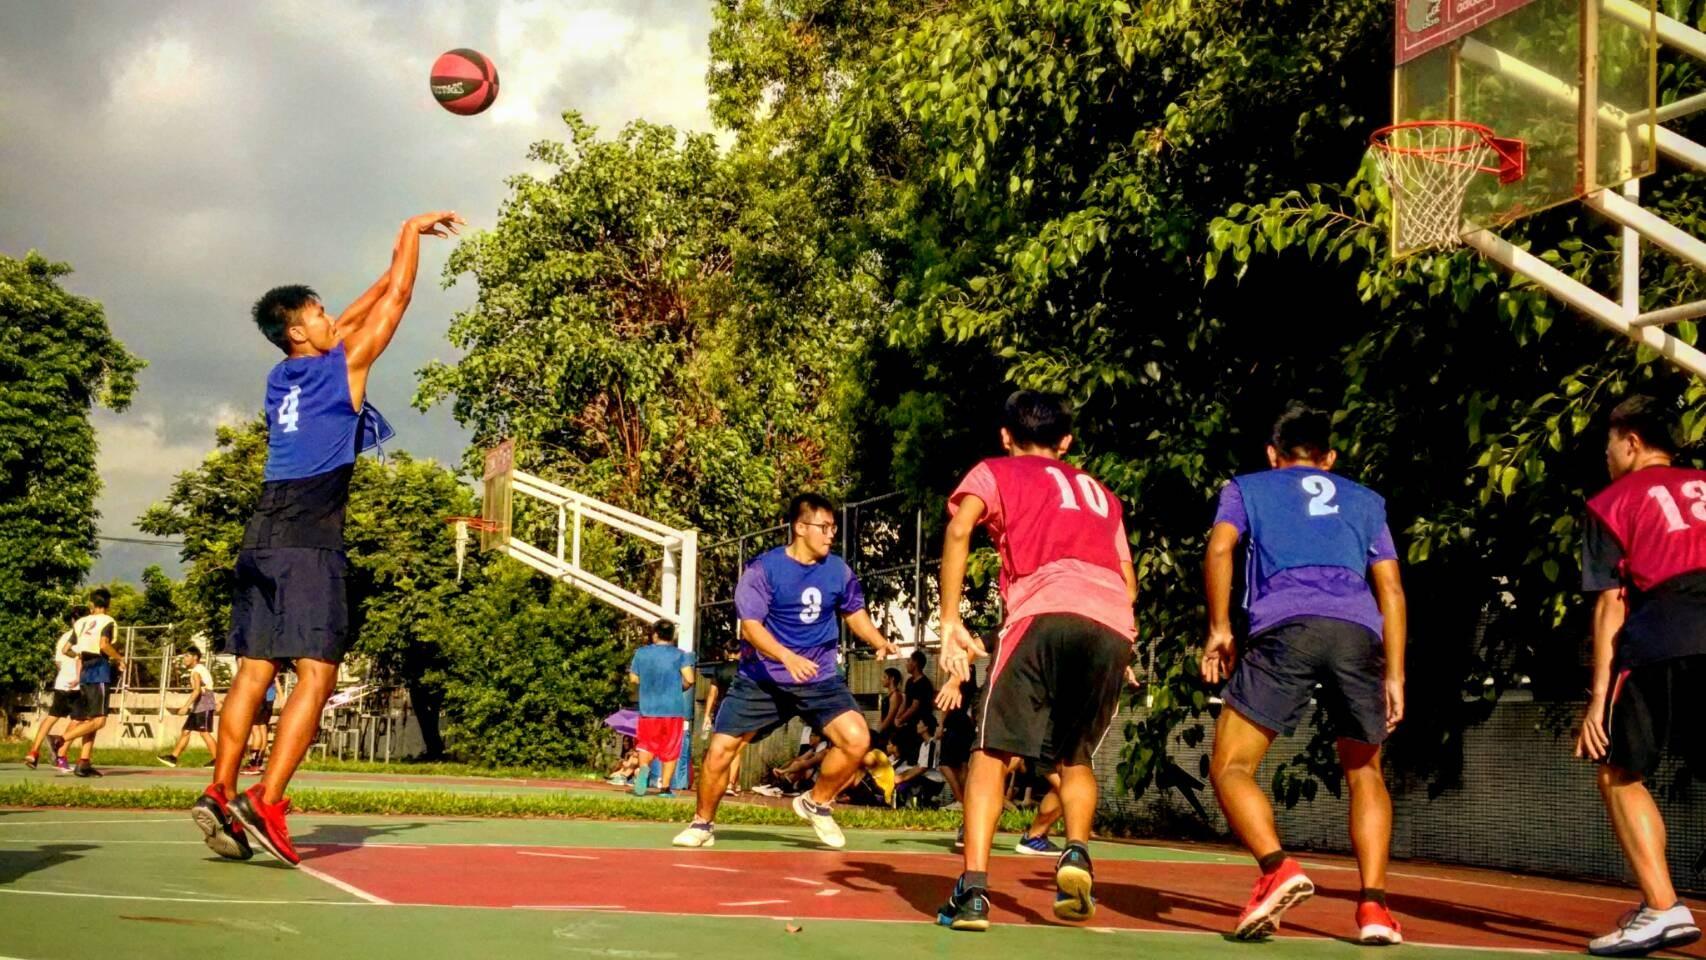 籃球3對3規則